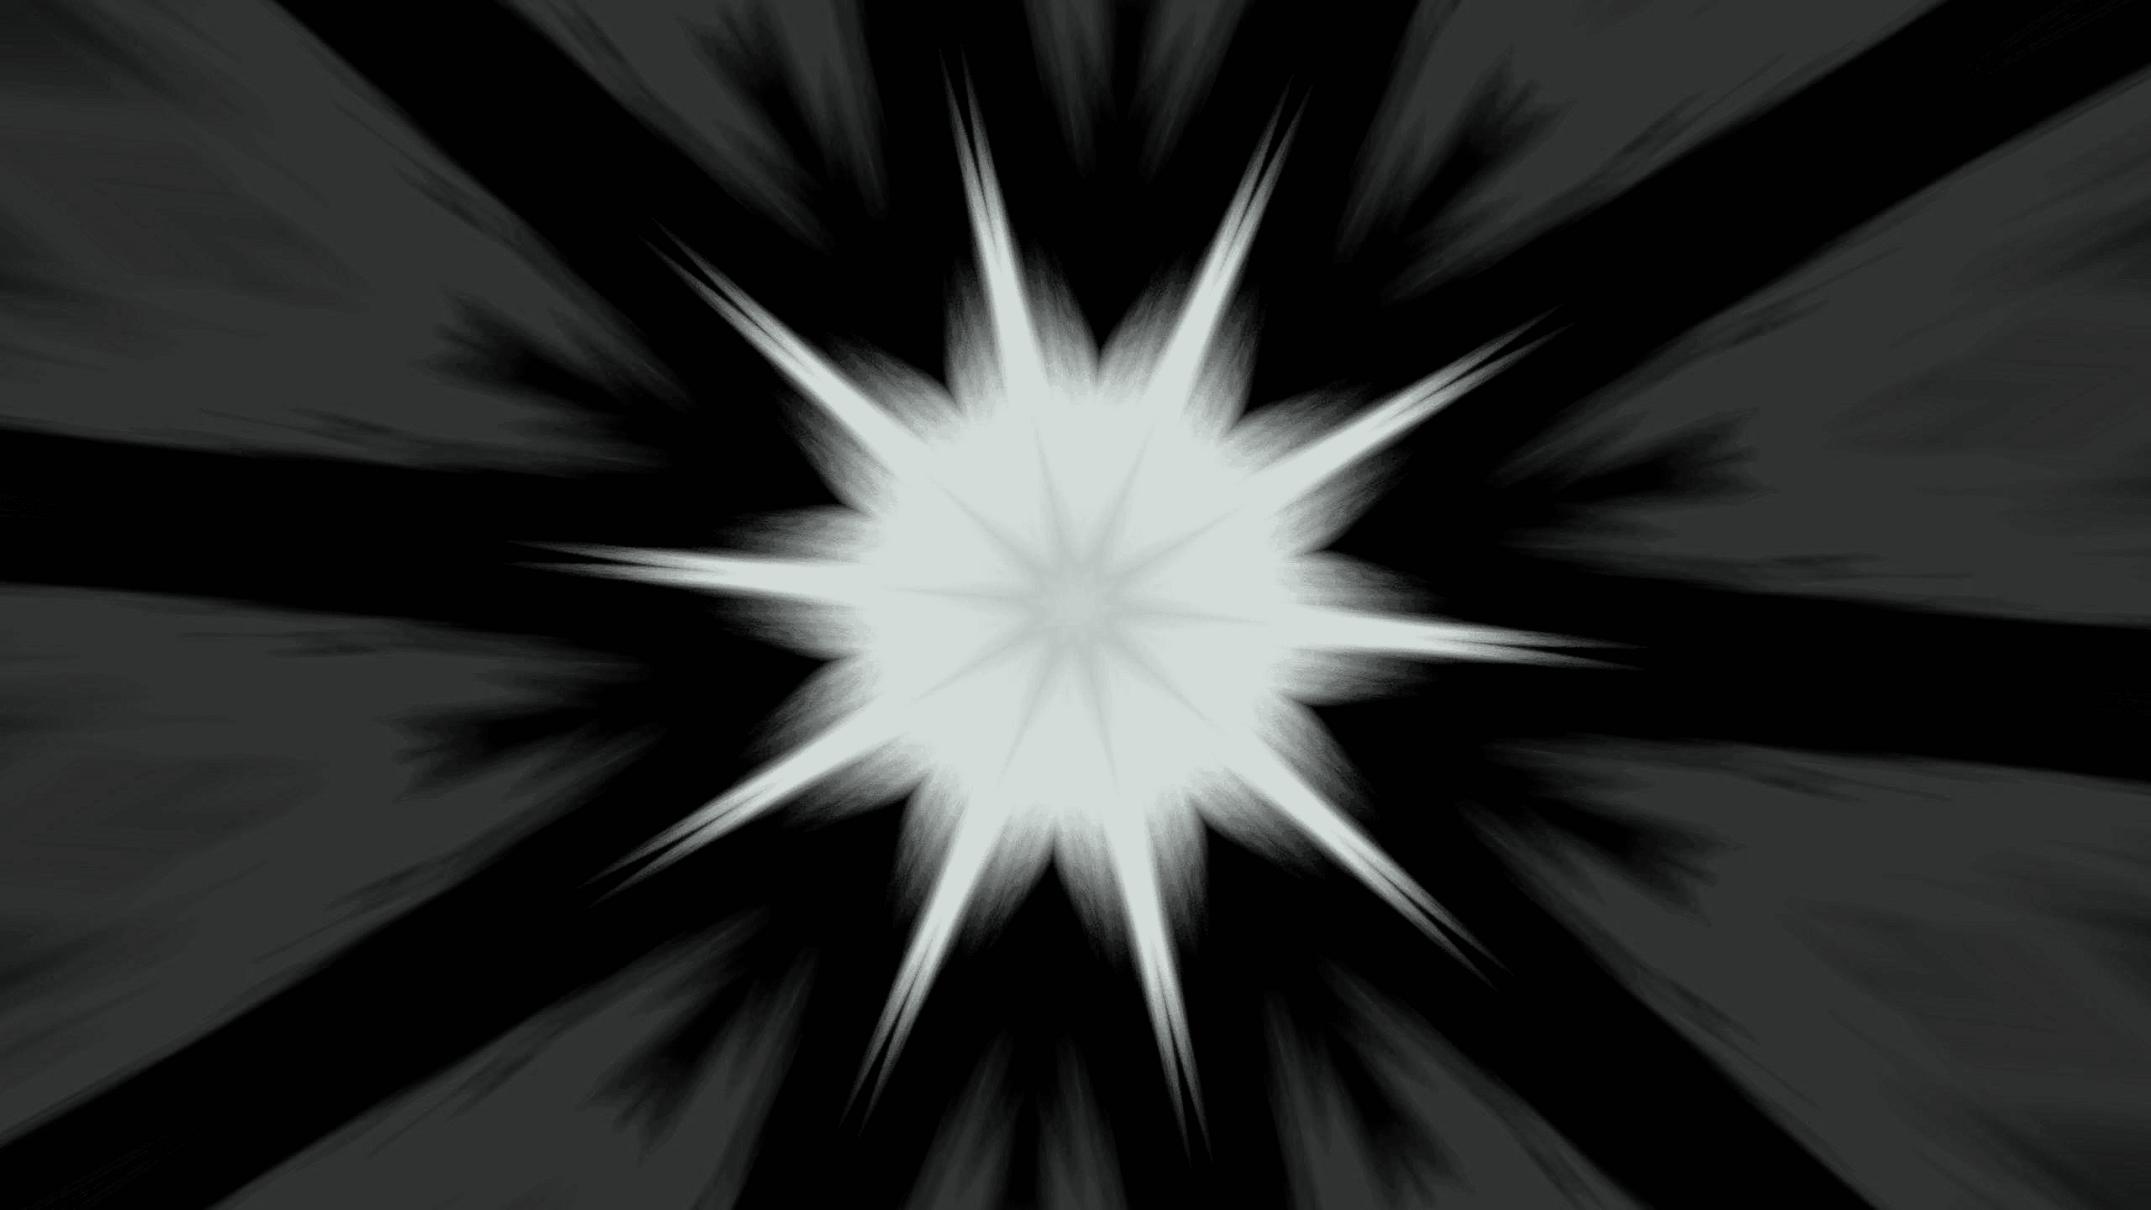 Image ID: 187702